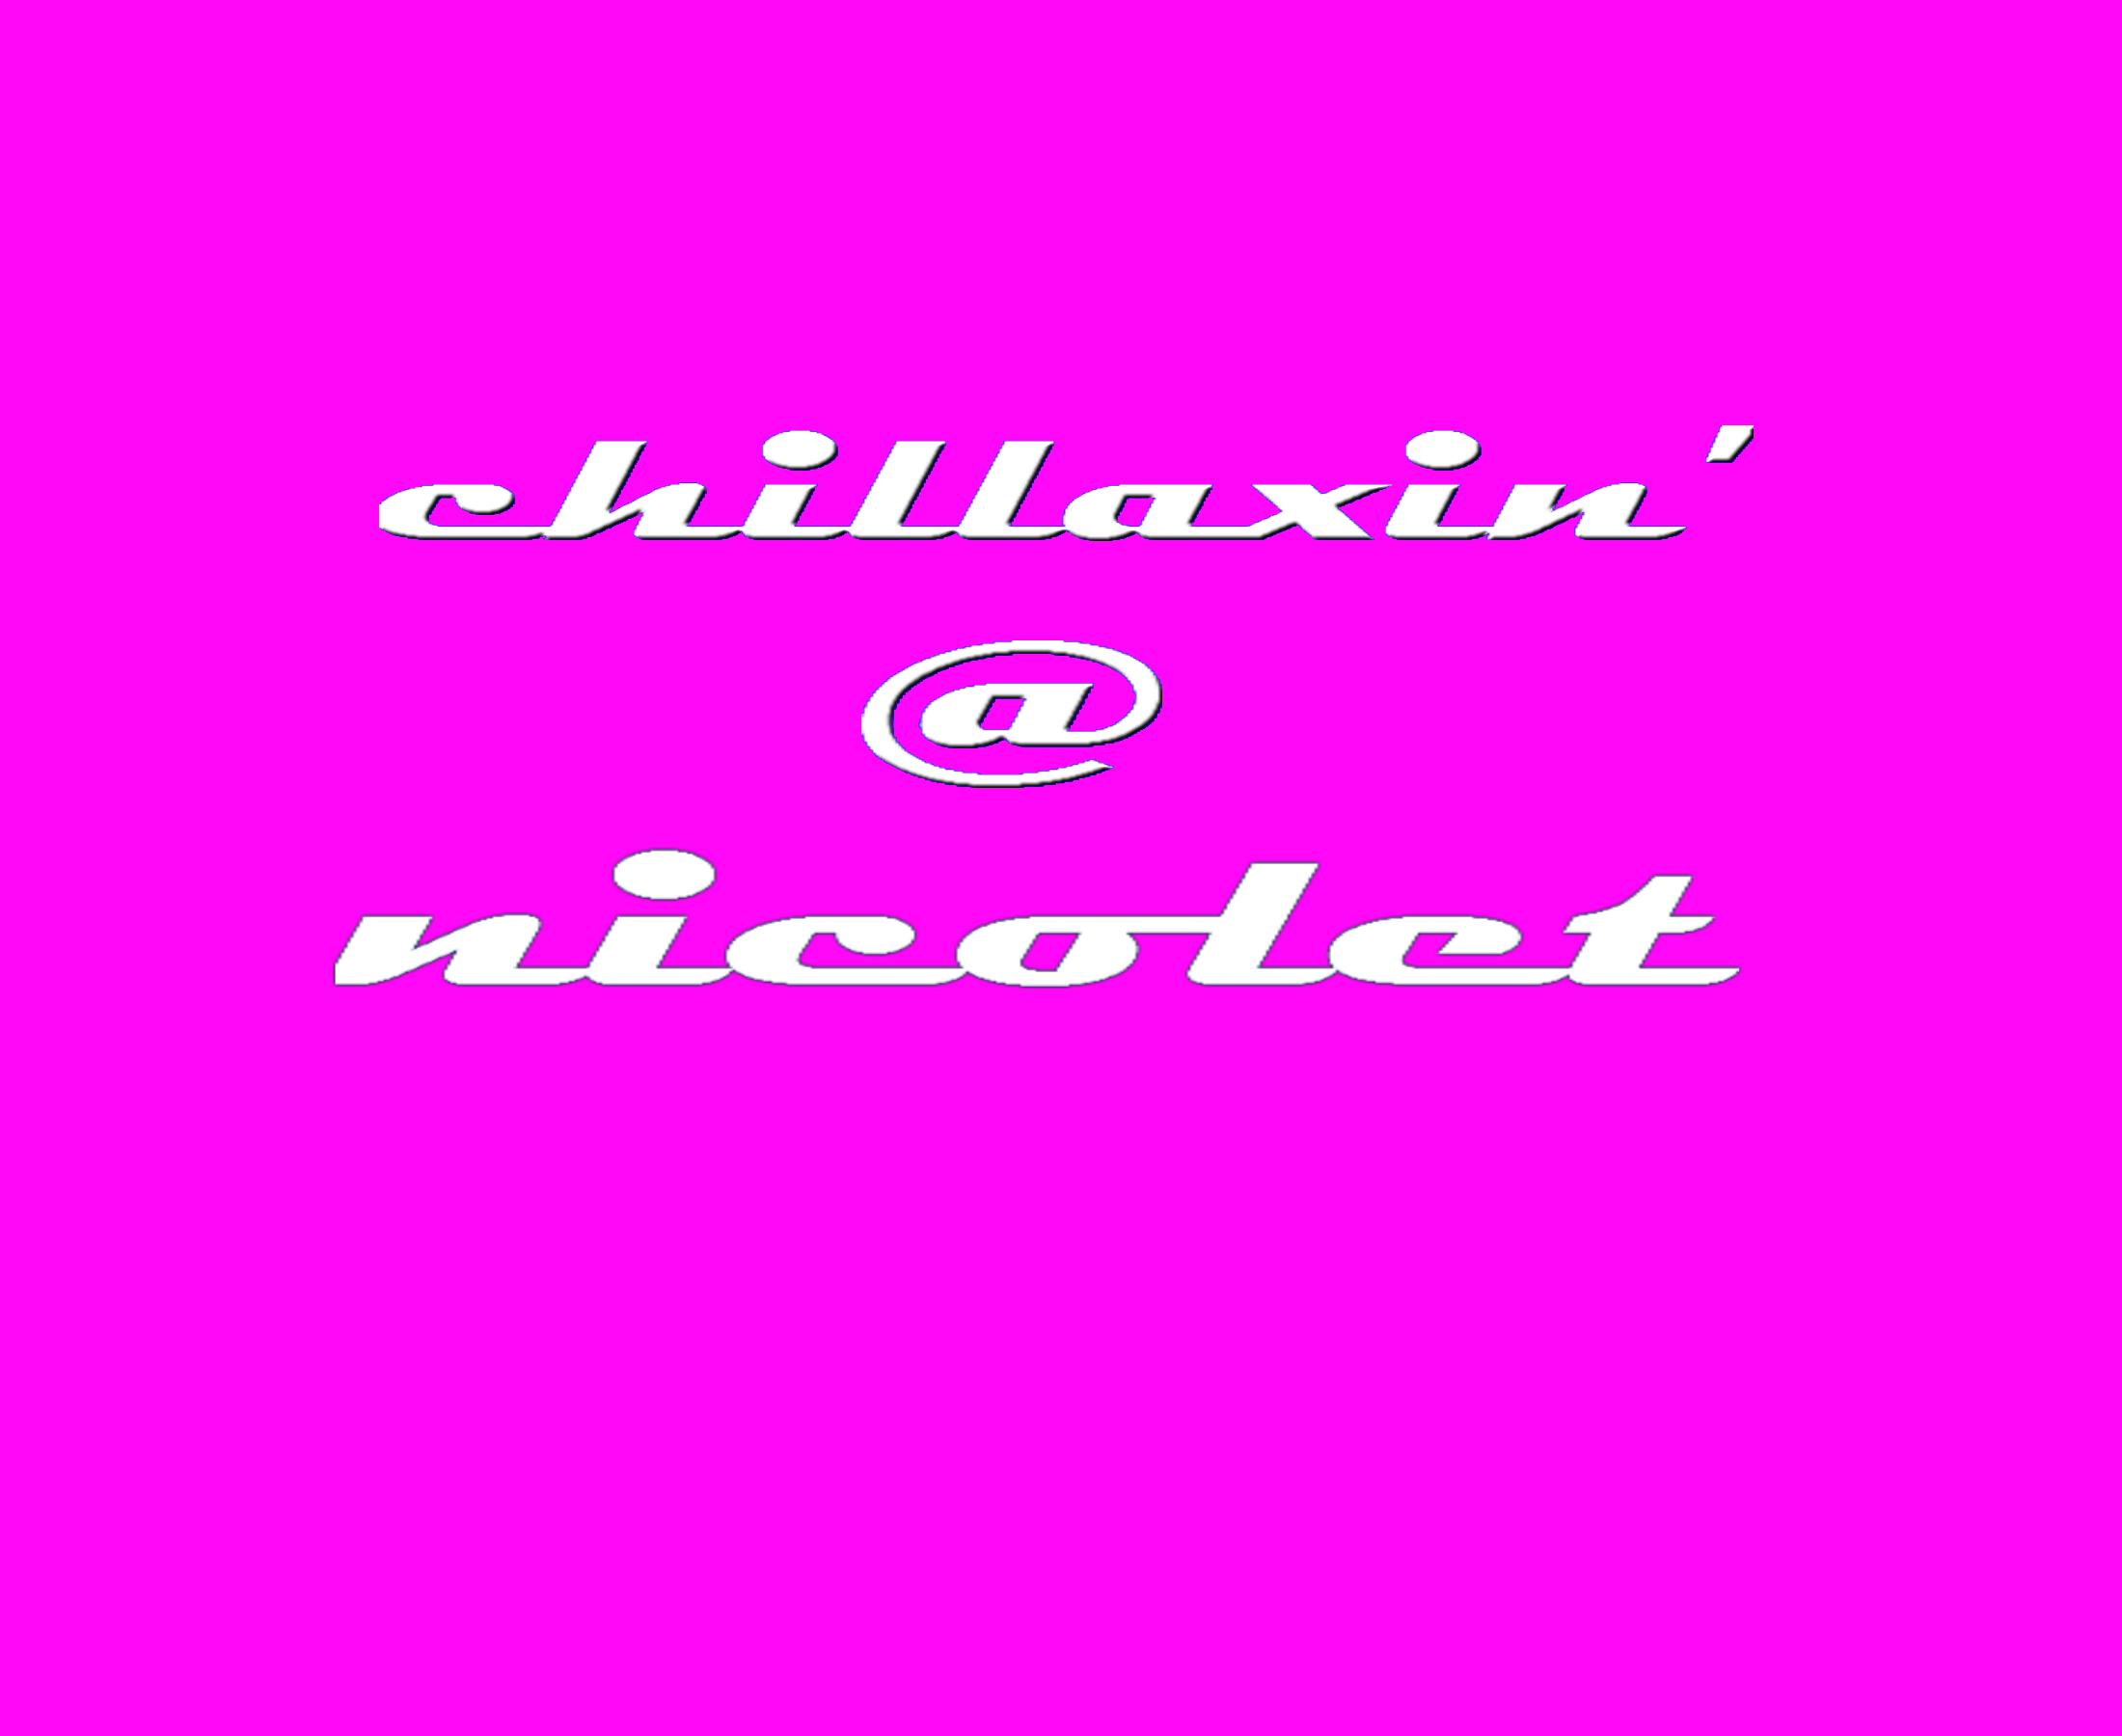 CHILLAXIN' AT NICOLET